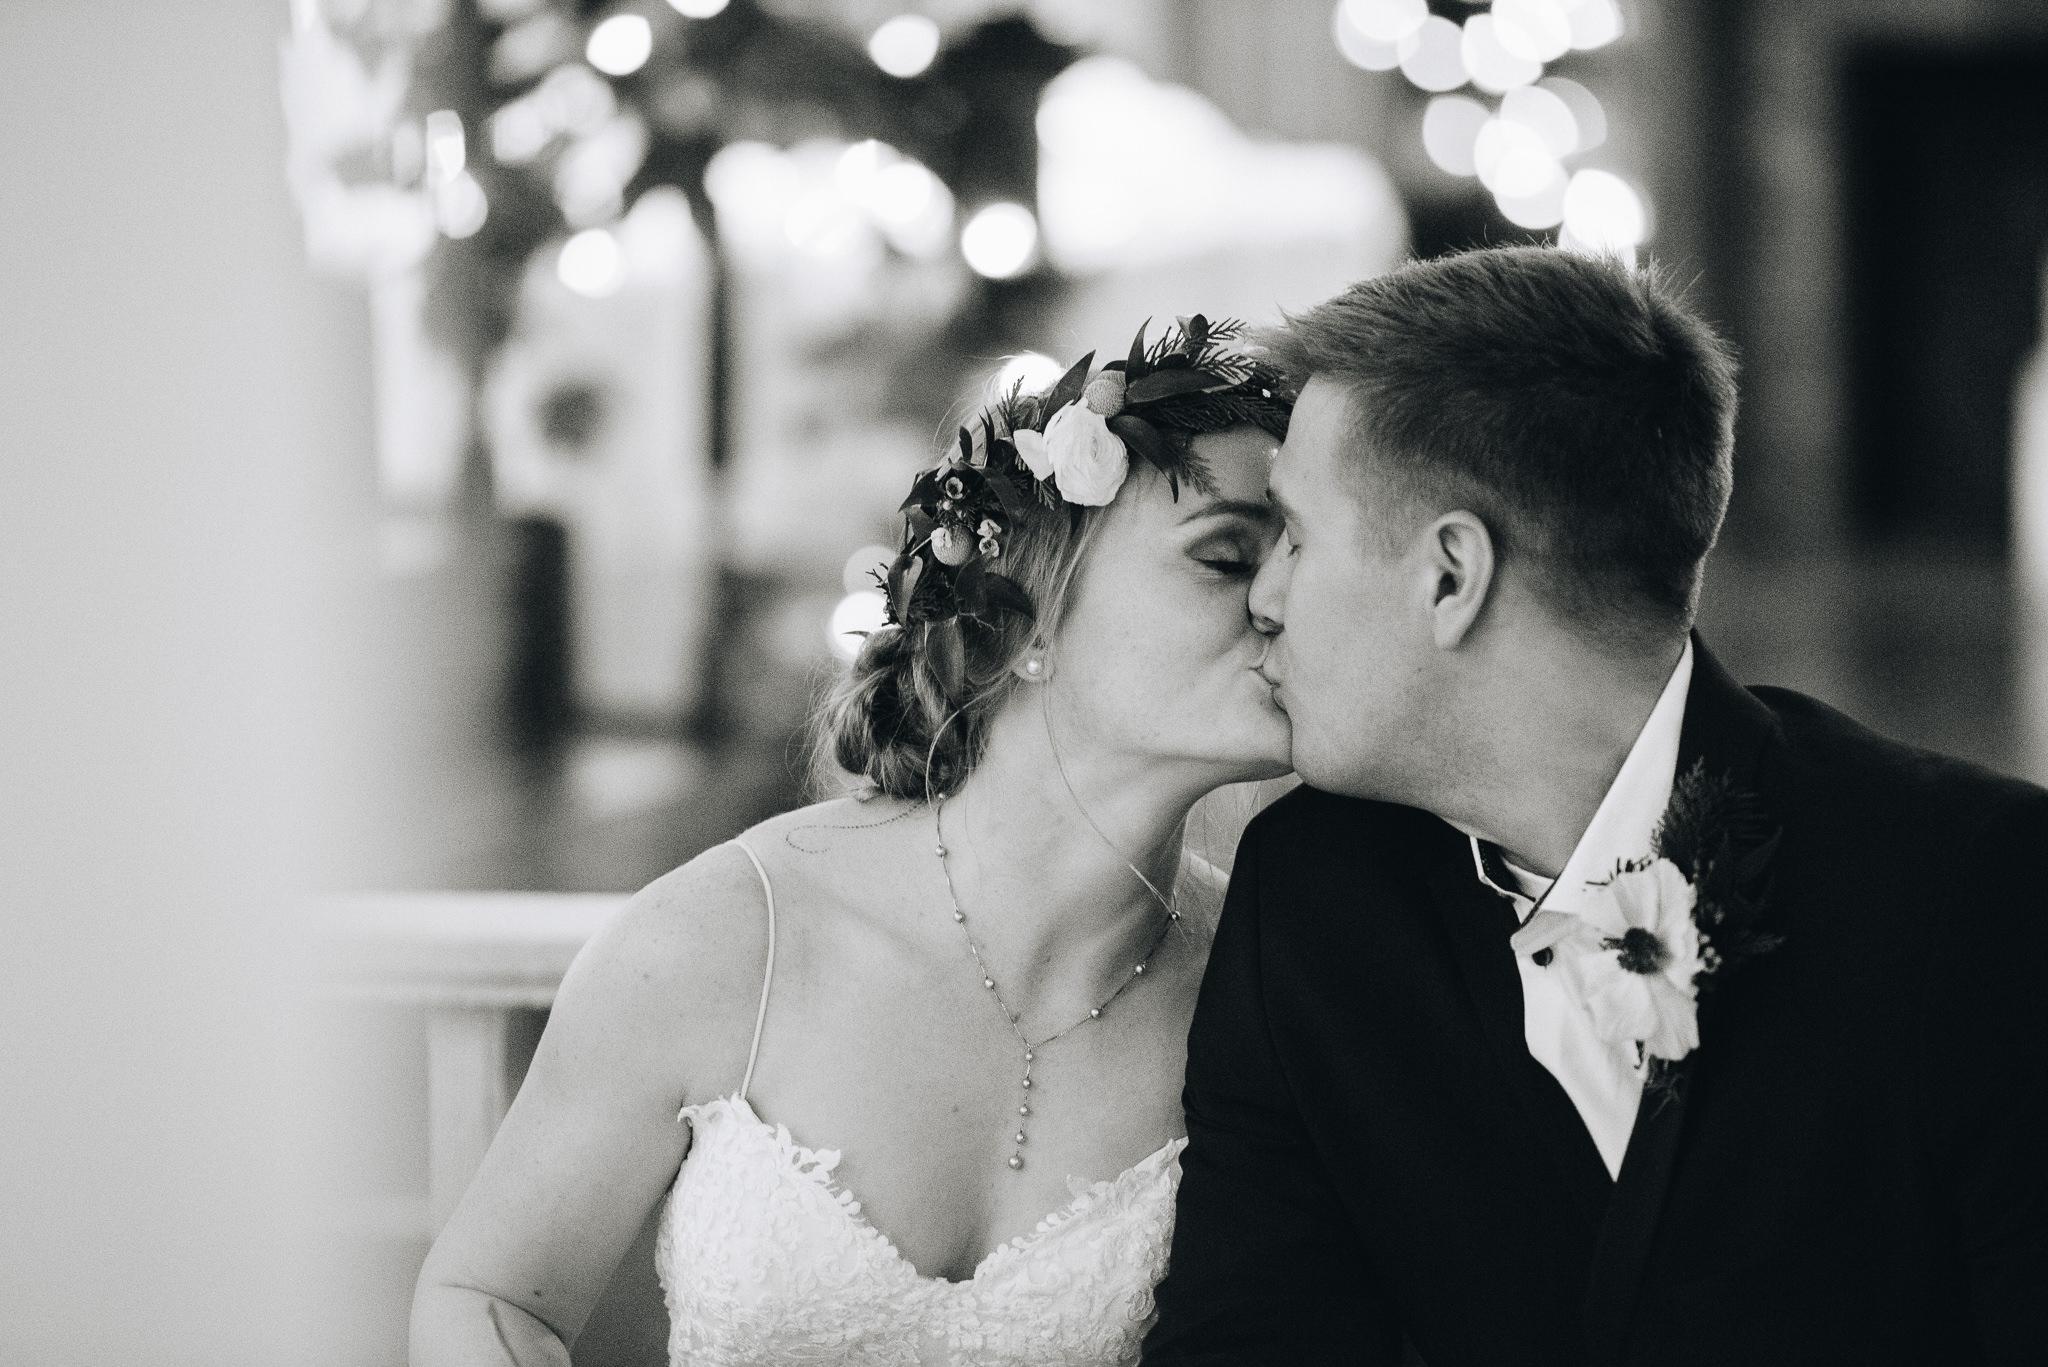 Trevor-Hooper-Wedding-Photographer-The-Bungalow-Wedding-Utah_BW_052.jpg